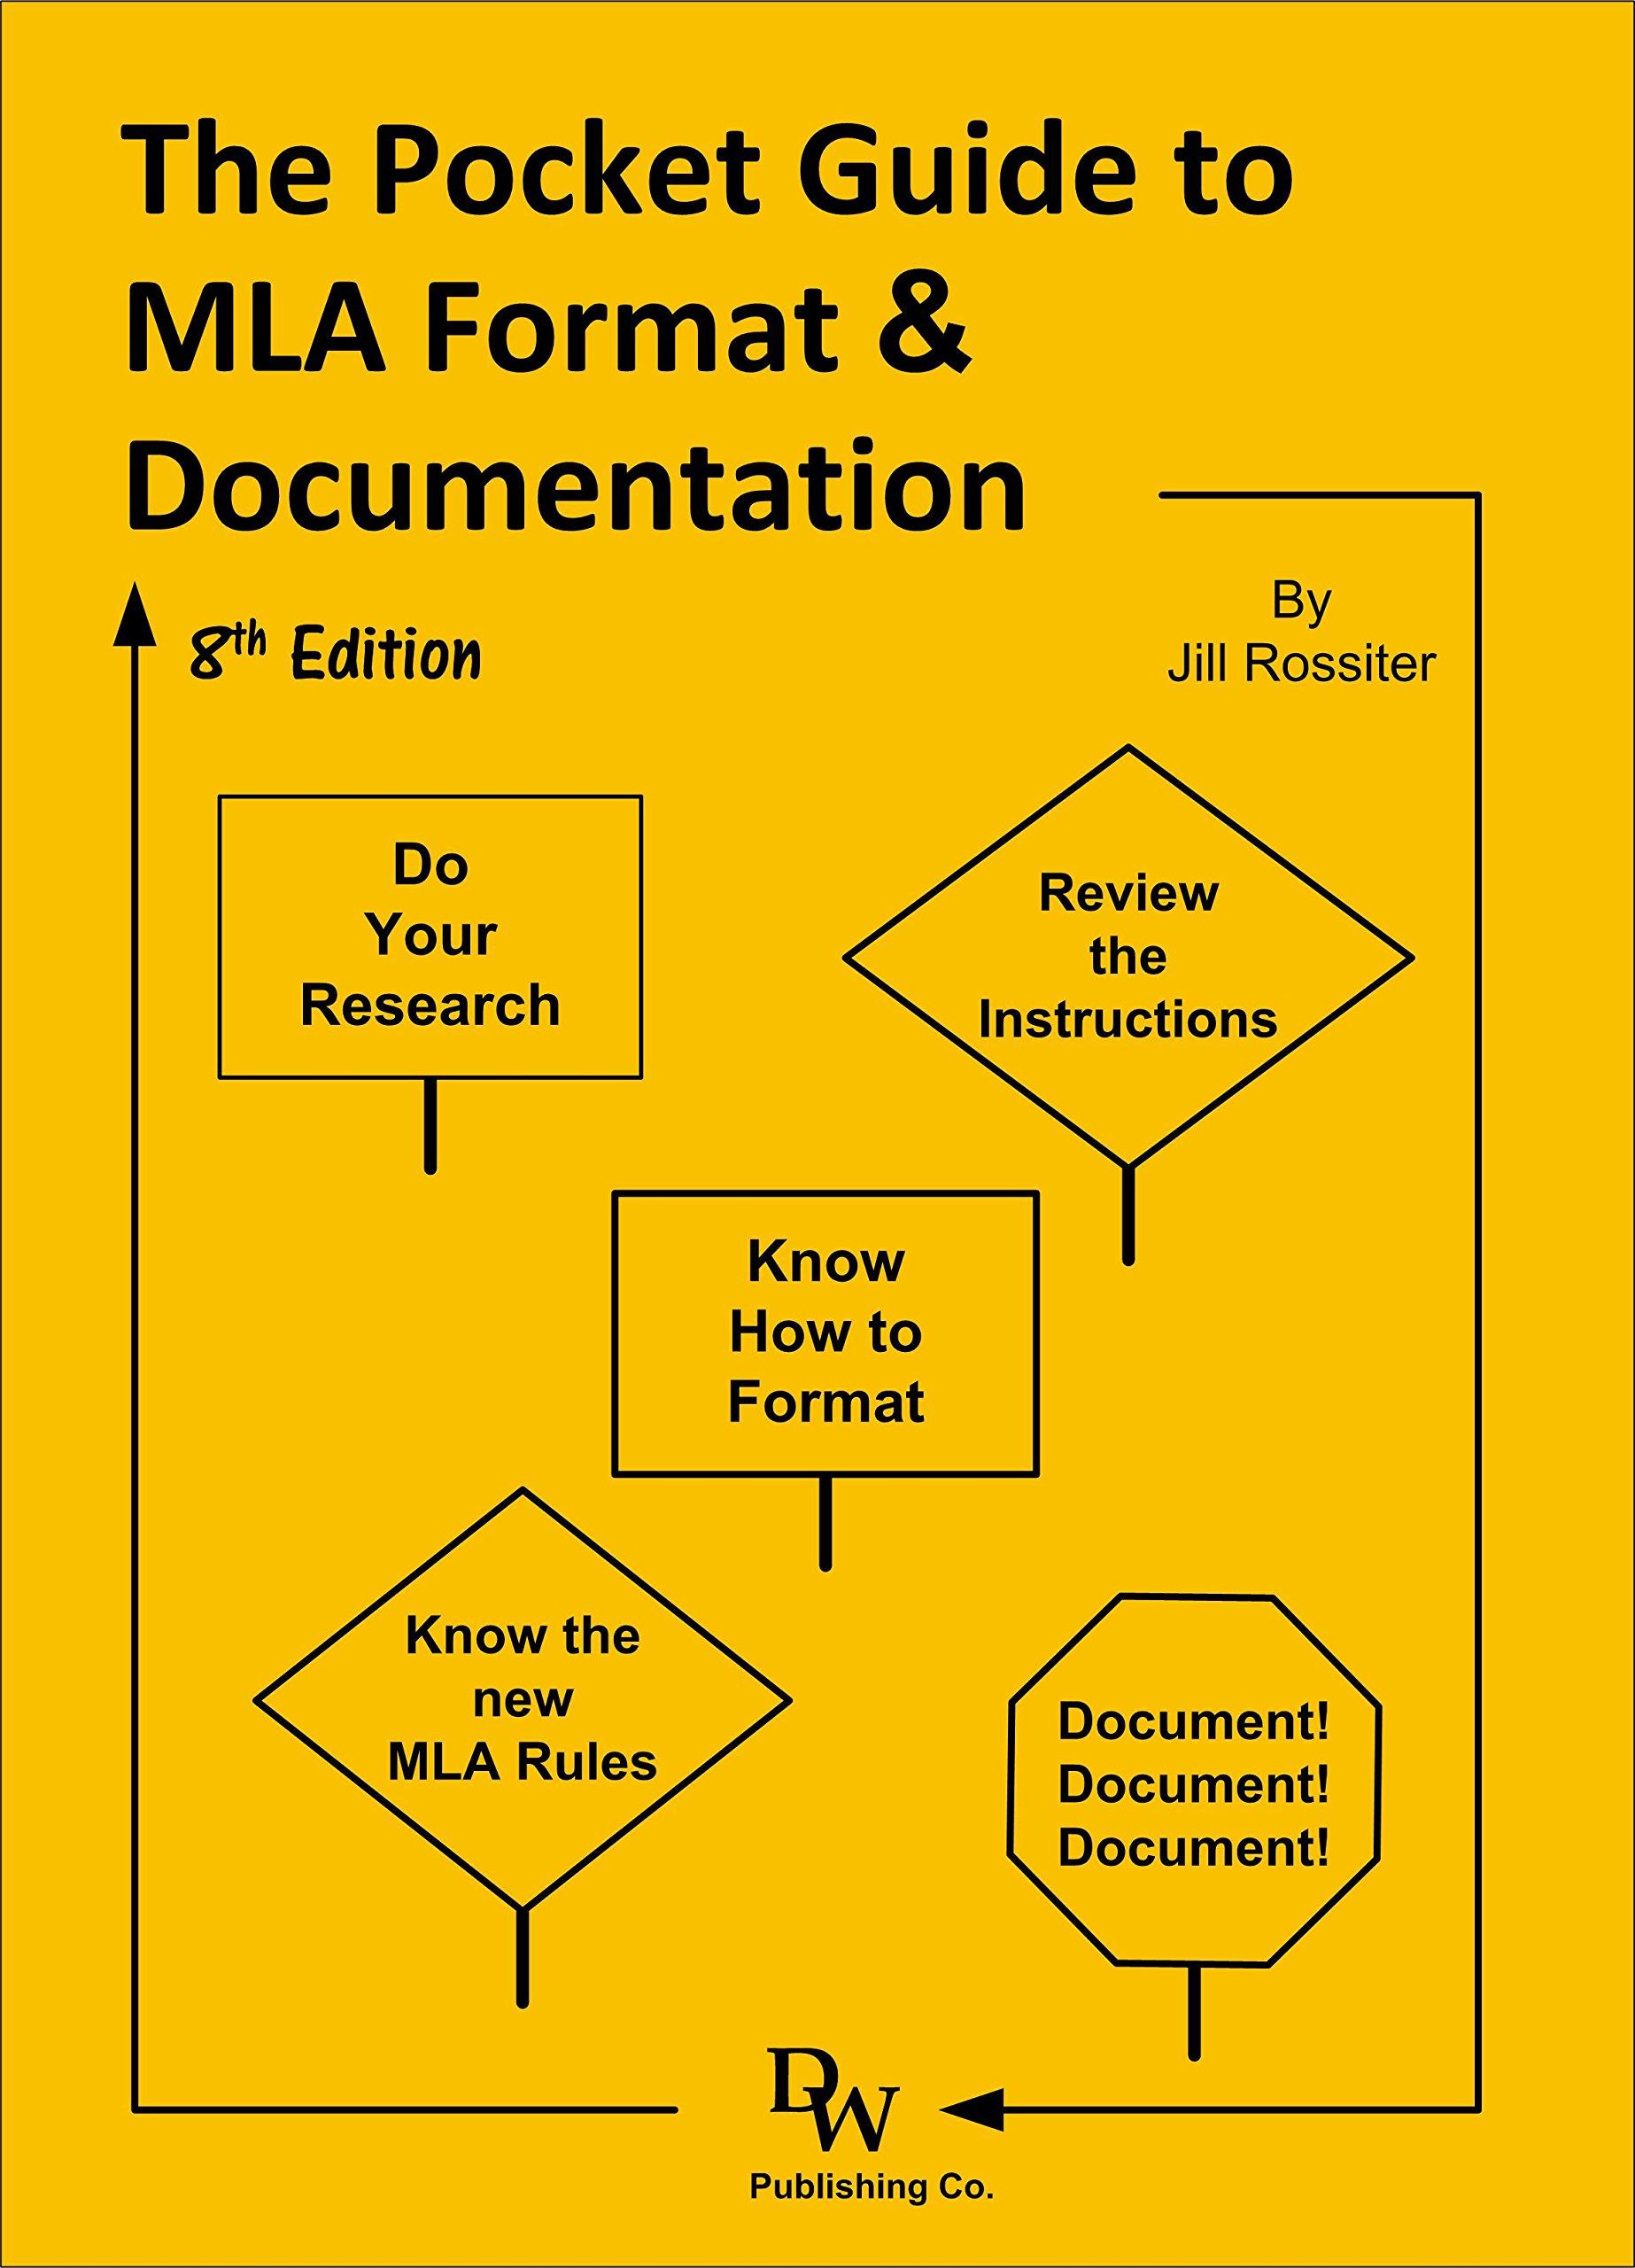 the pocket guide to mla format documentation jill rossiter